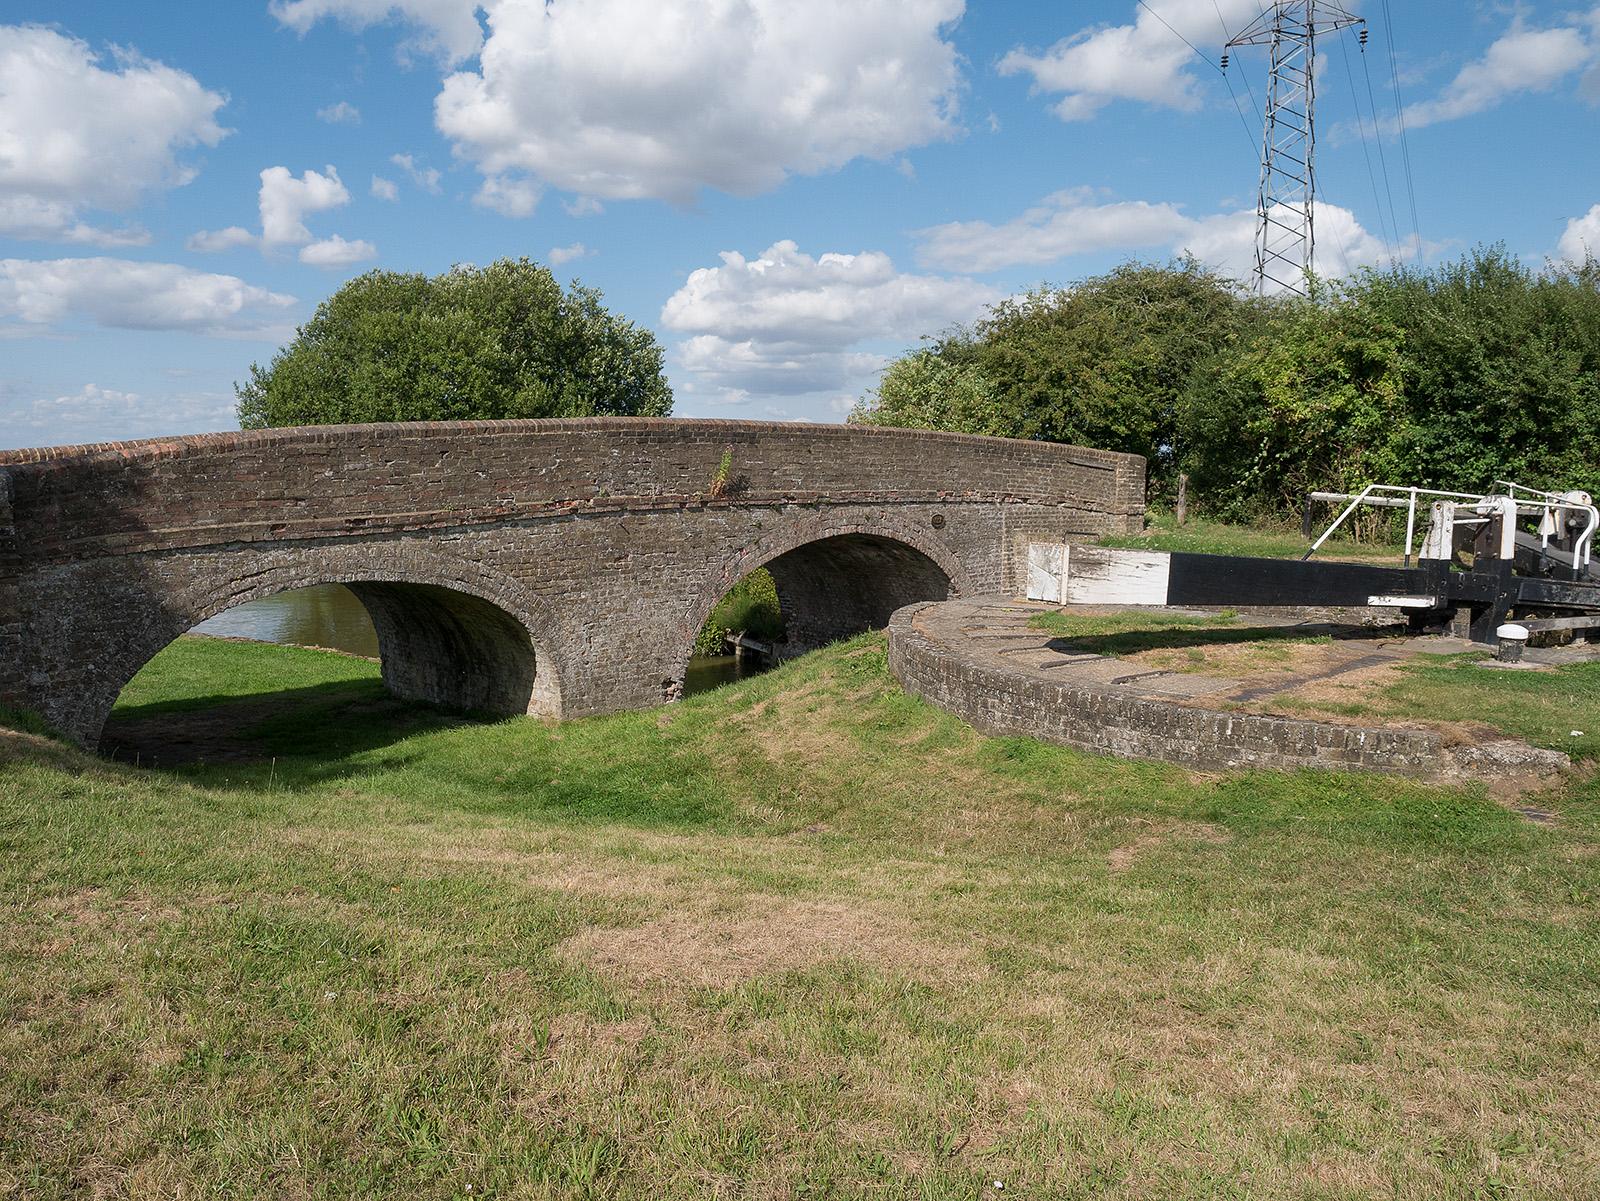 Bridge 122 and Ivinghoe locks - note the unused archway